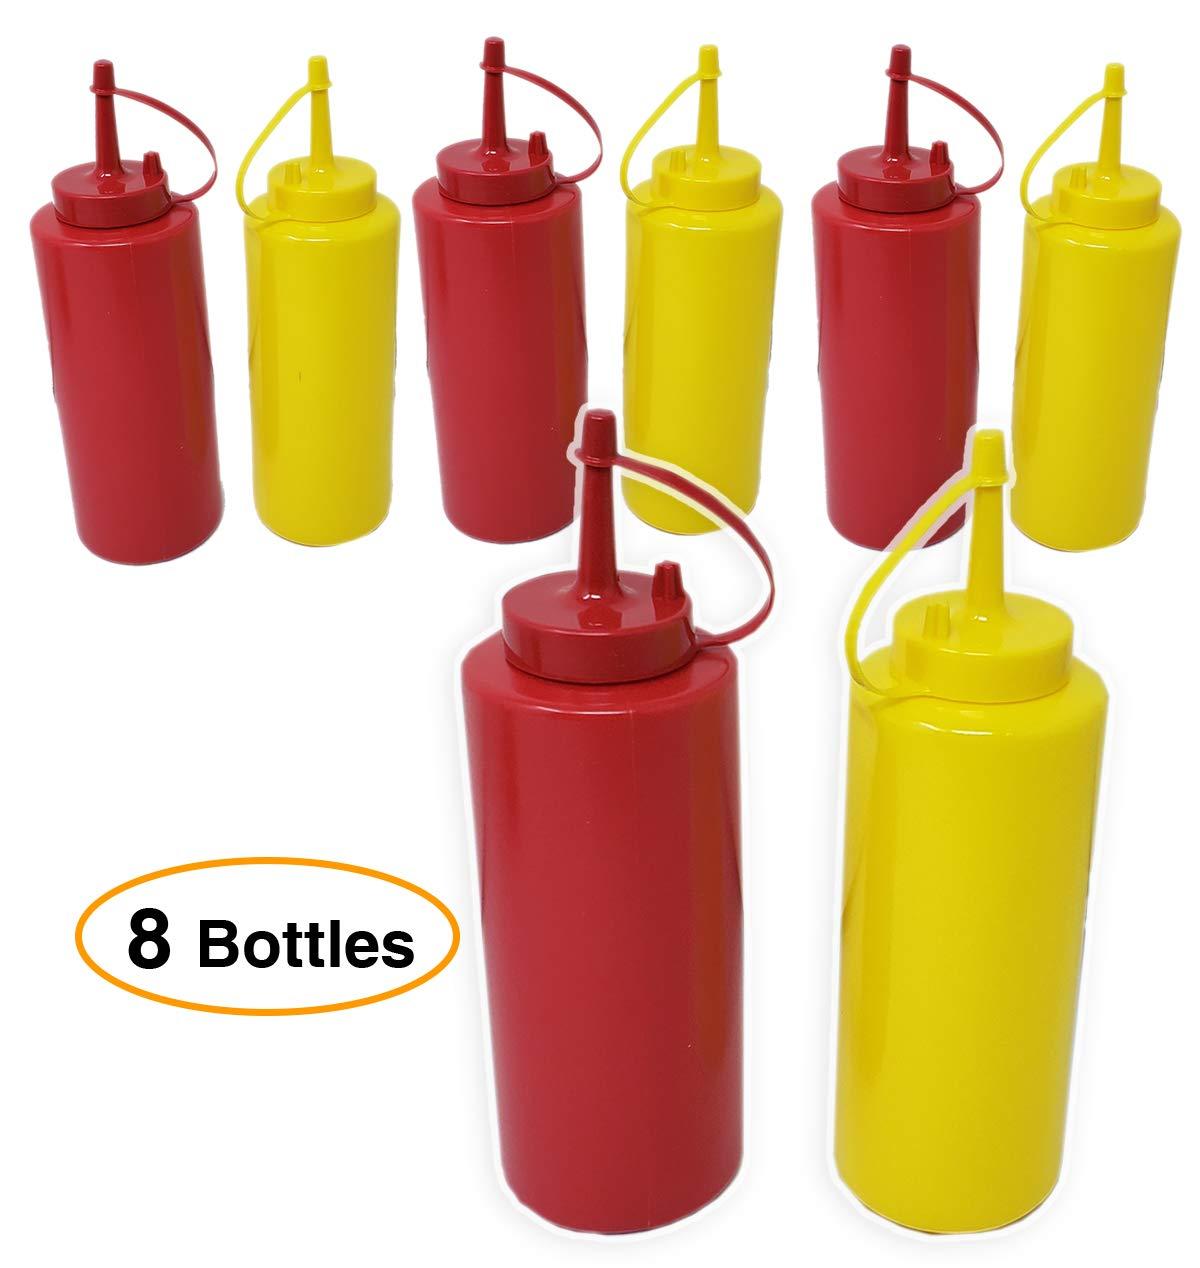 Ketchup & Mustard Dispensers No Drip, Set, 4 -pack (8 bottles) – 12 oz Durable With Lid/Cap Premium Plastic Squeeze Squirt Condiment Bottles